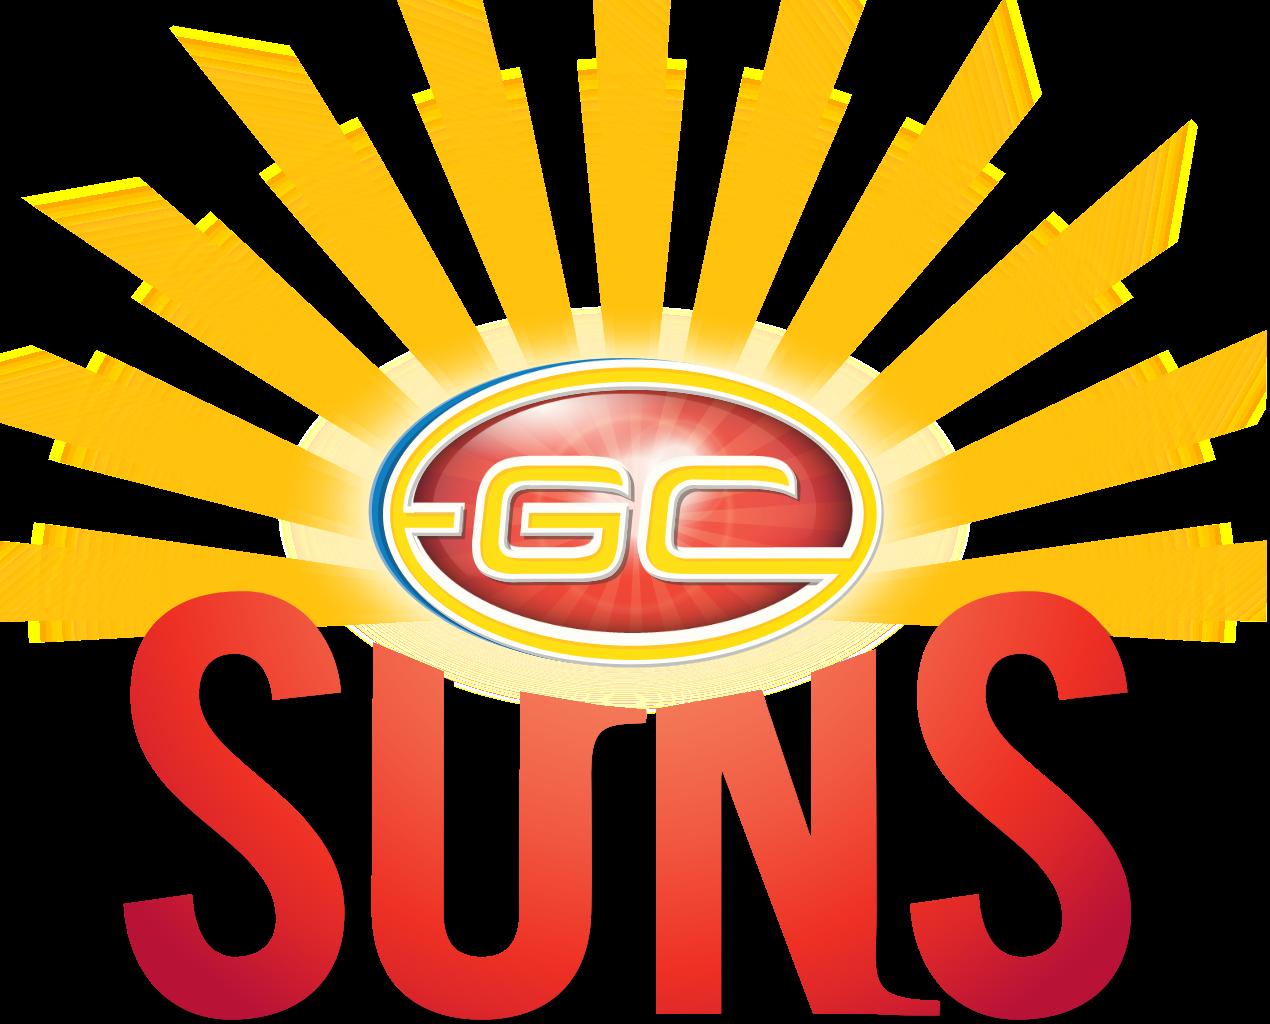 1270px-Gold Coast Suns logo.png - Basic Sun PNG